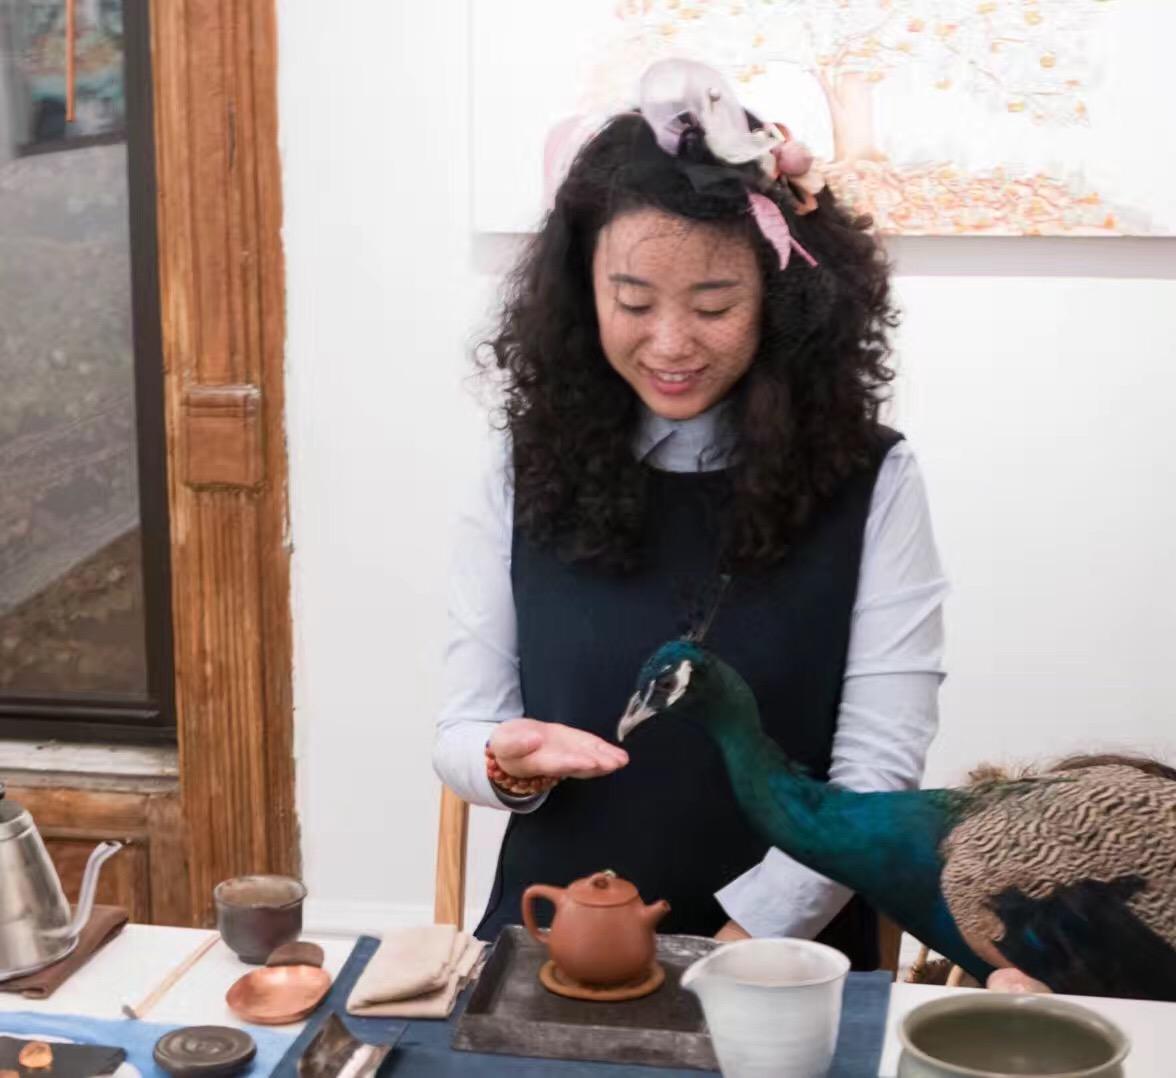 Mai Tian at Fou Gallery in 2017. 2017年11月麦田在否画廊举行茶会,摄影:陈琳